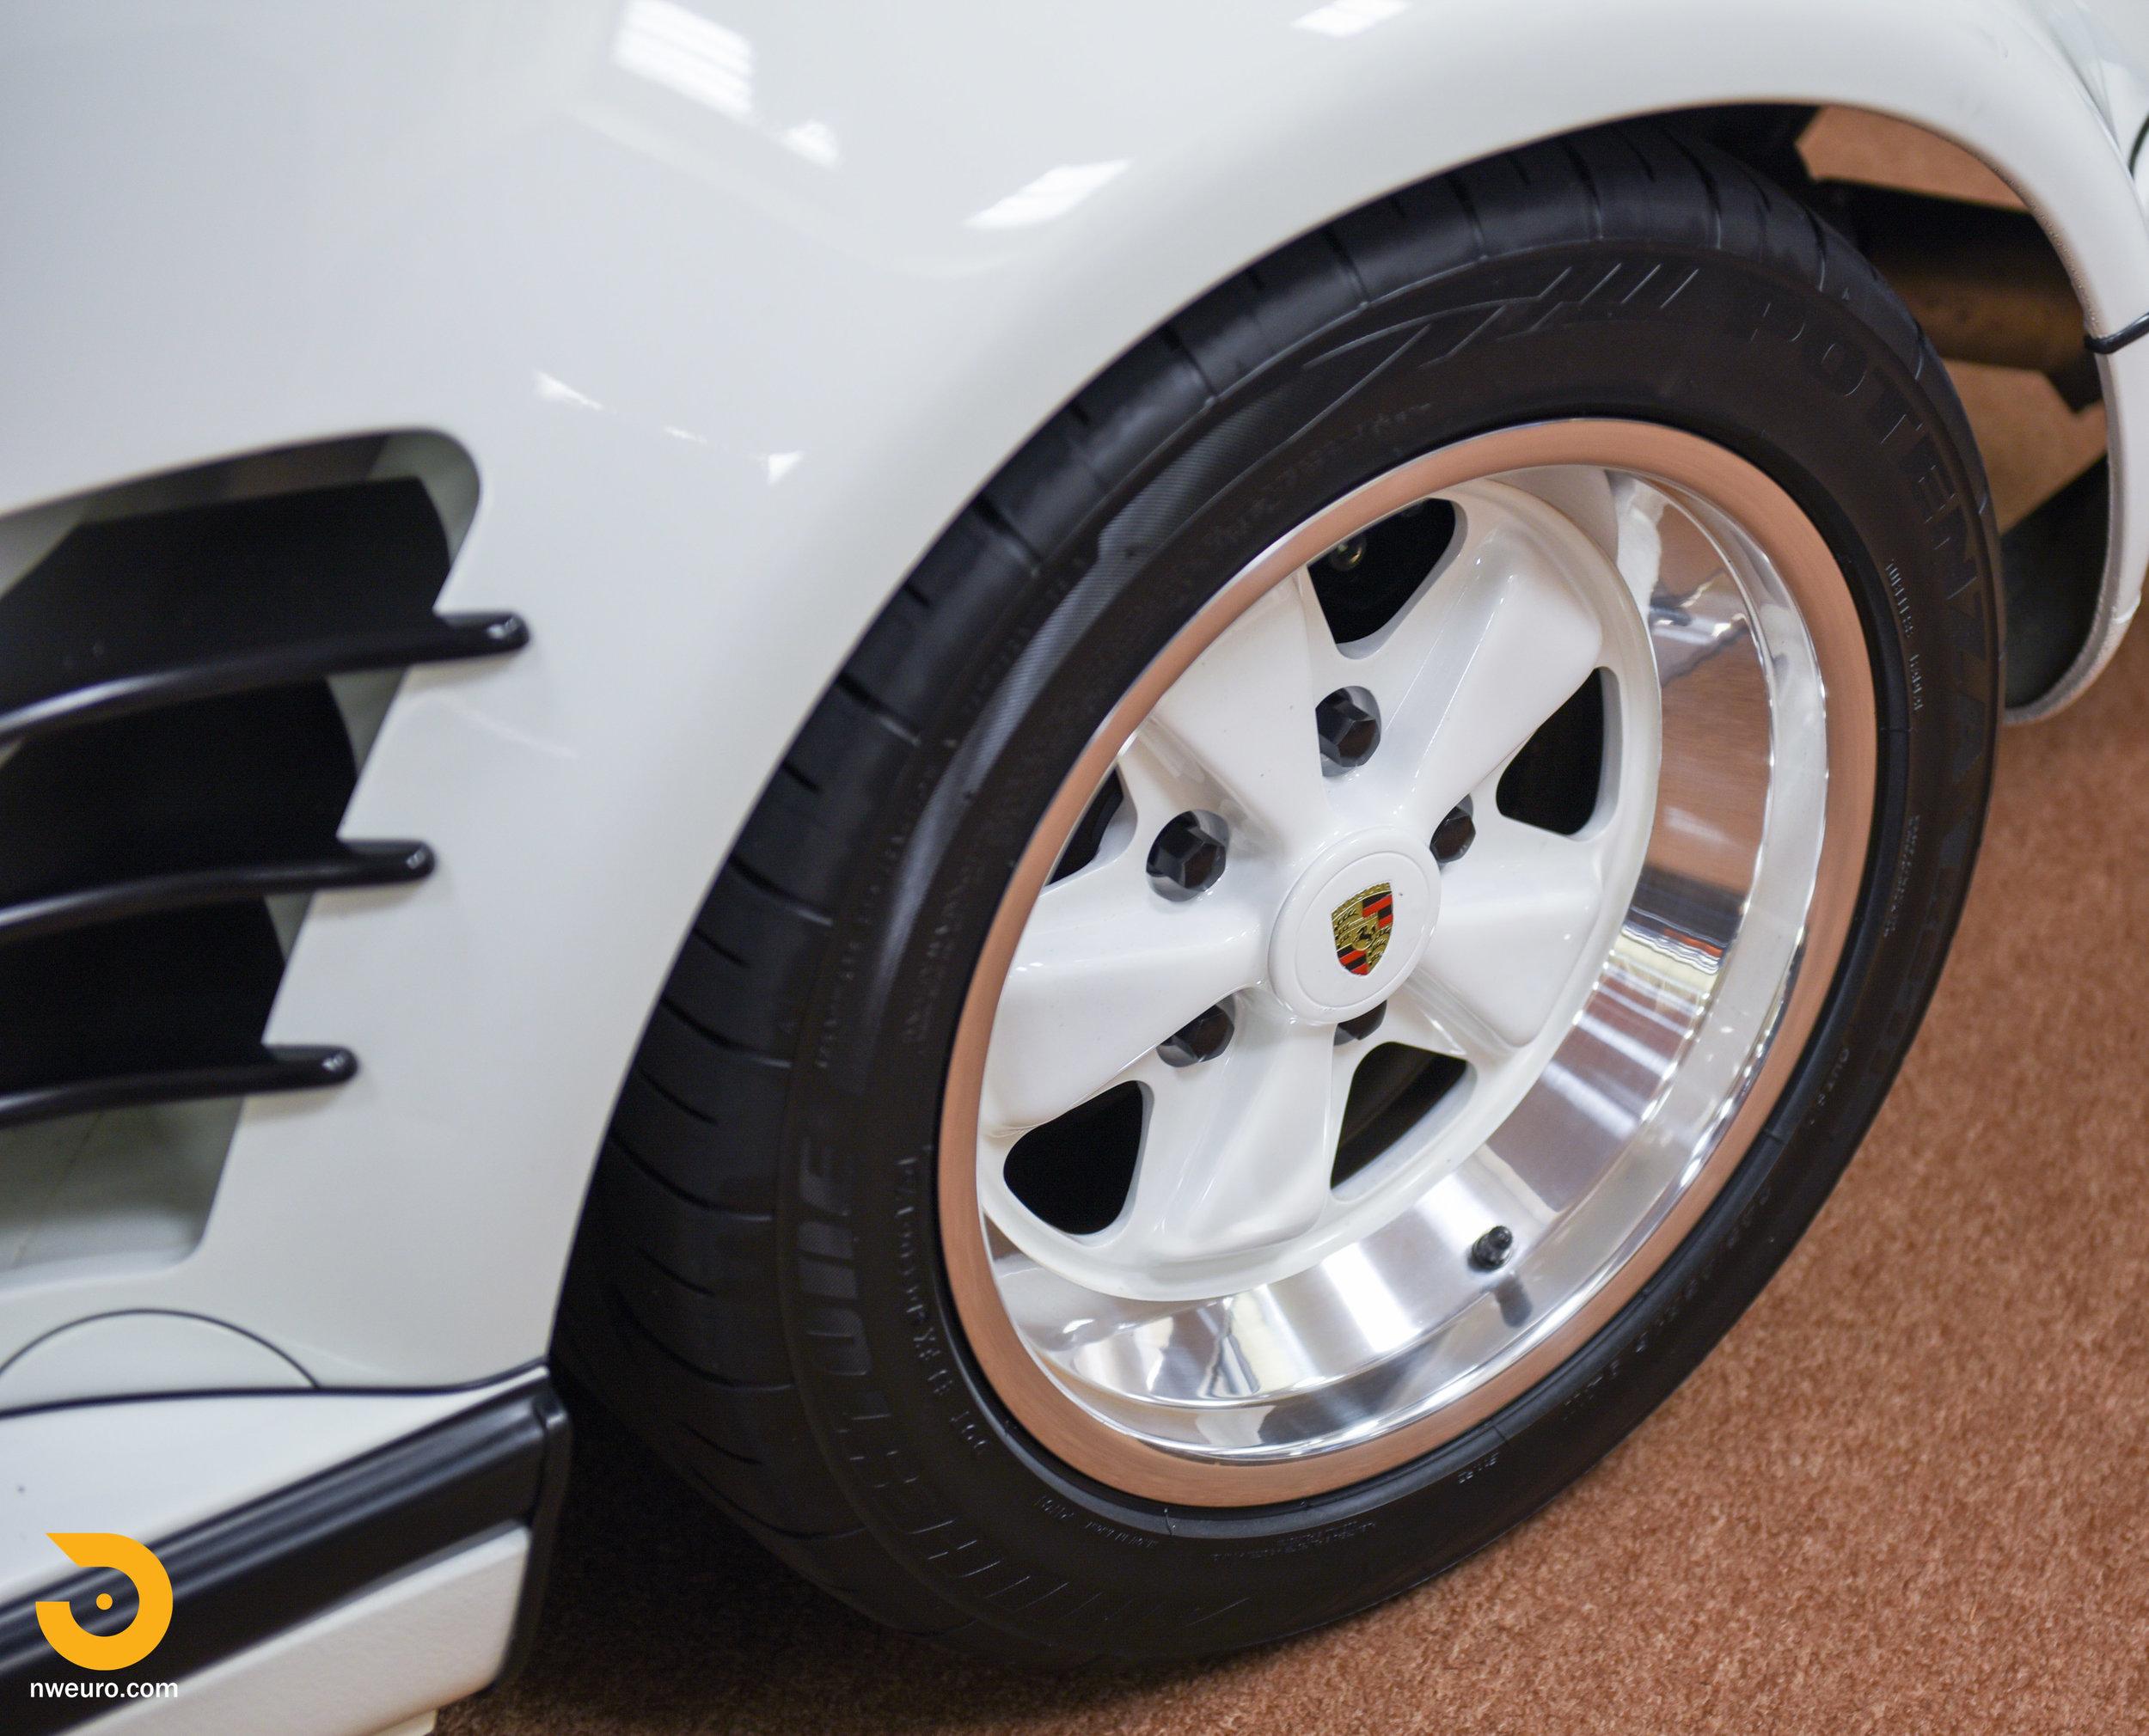 1987 Porsche 930 Slant Nose Cab Details-20.jpg